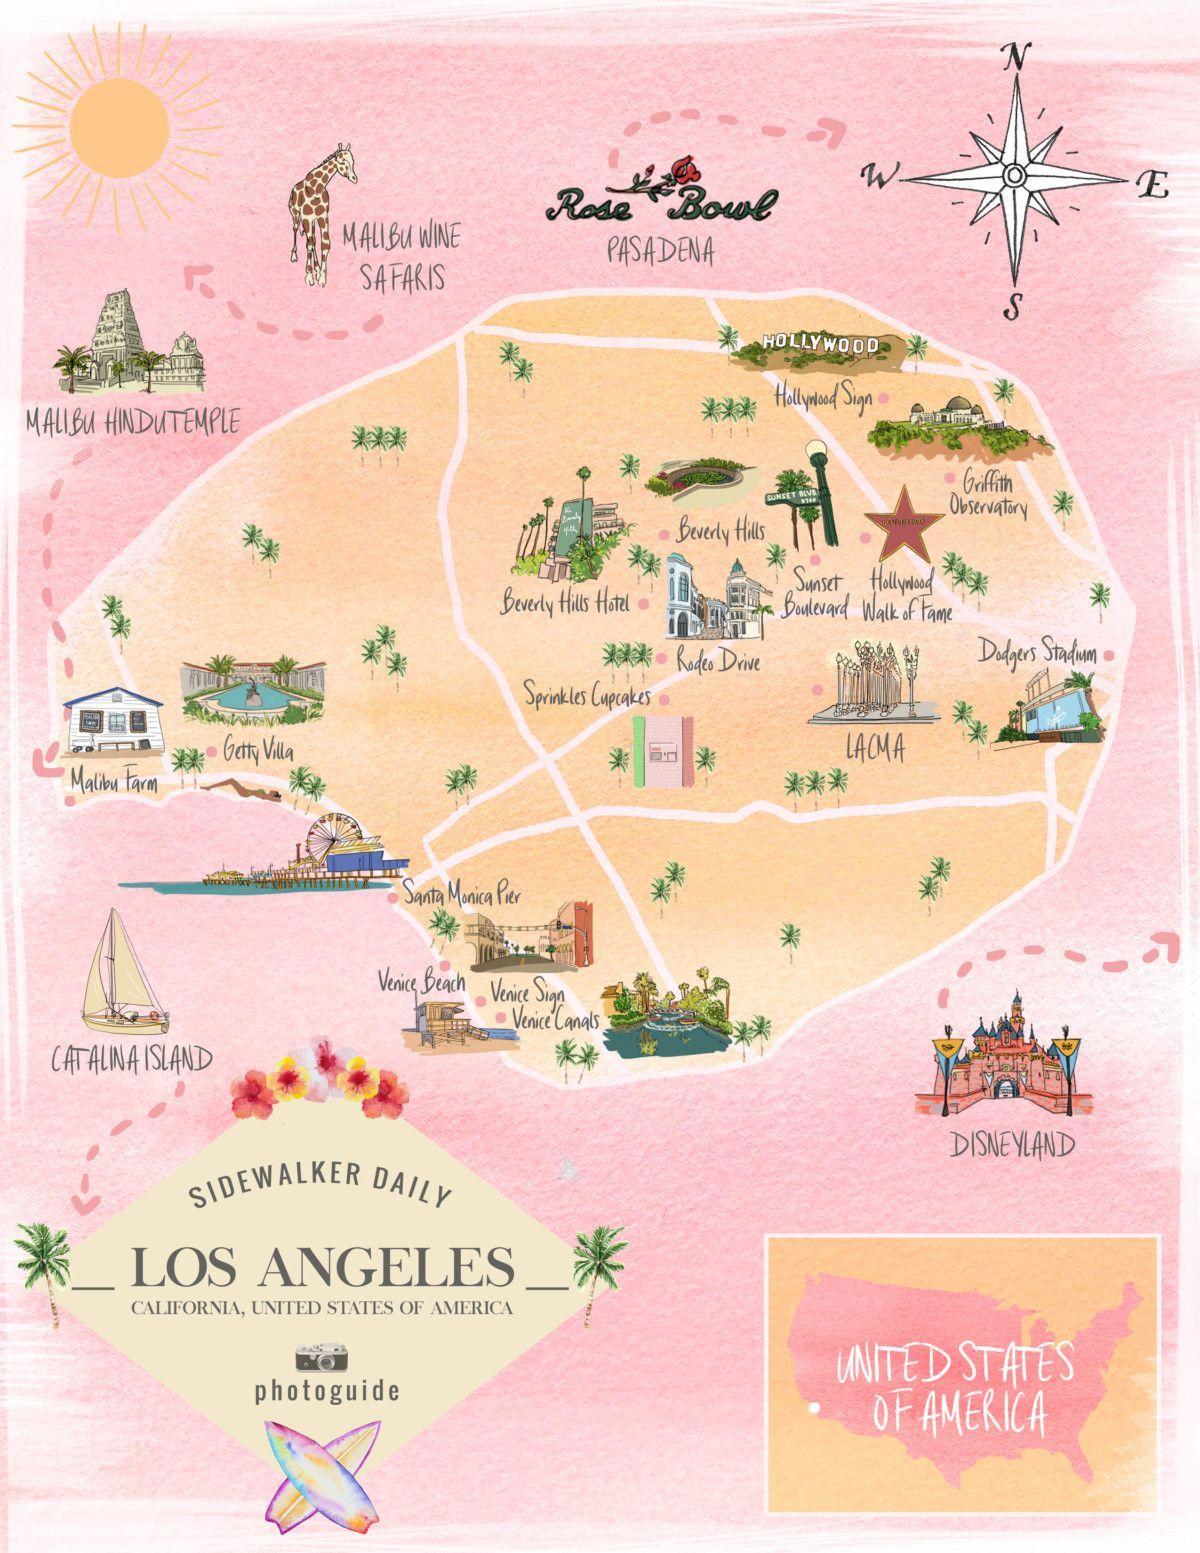 Photoguide Los Angeles California Sidewalker Daily California Travel Los Angeles Map California Travel Road Trips